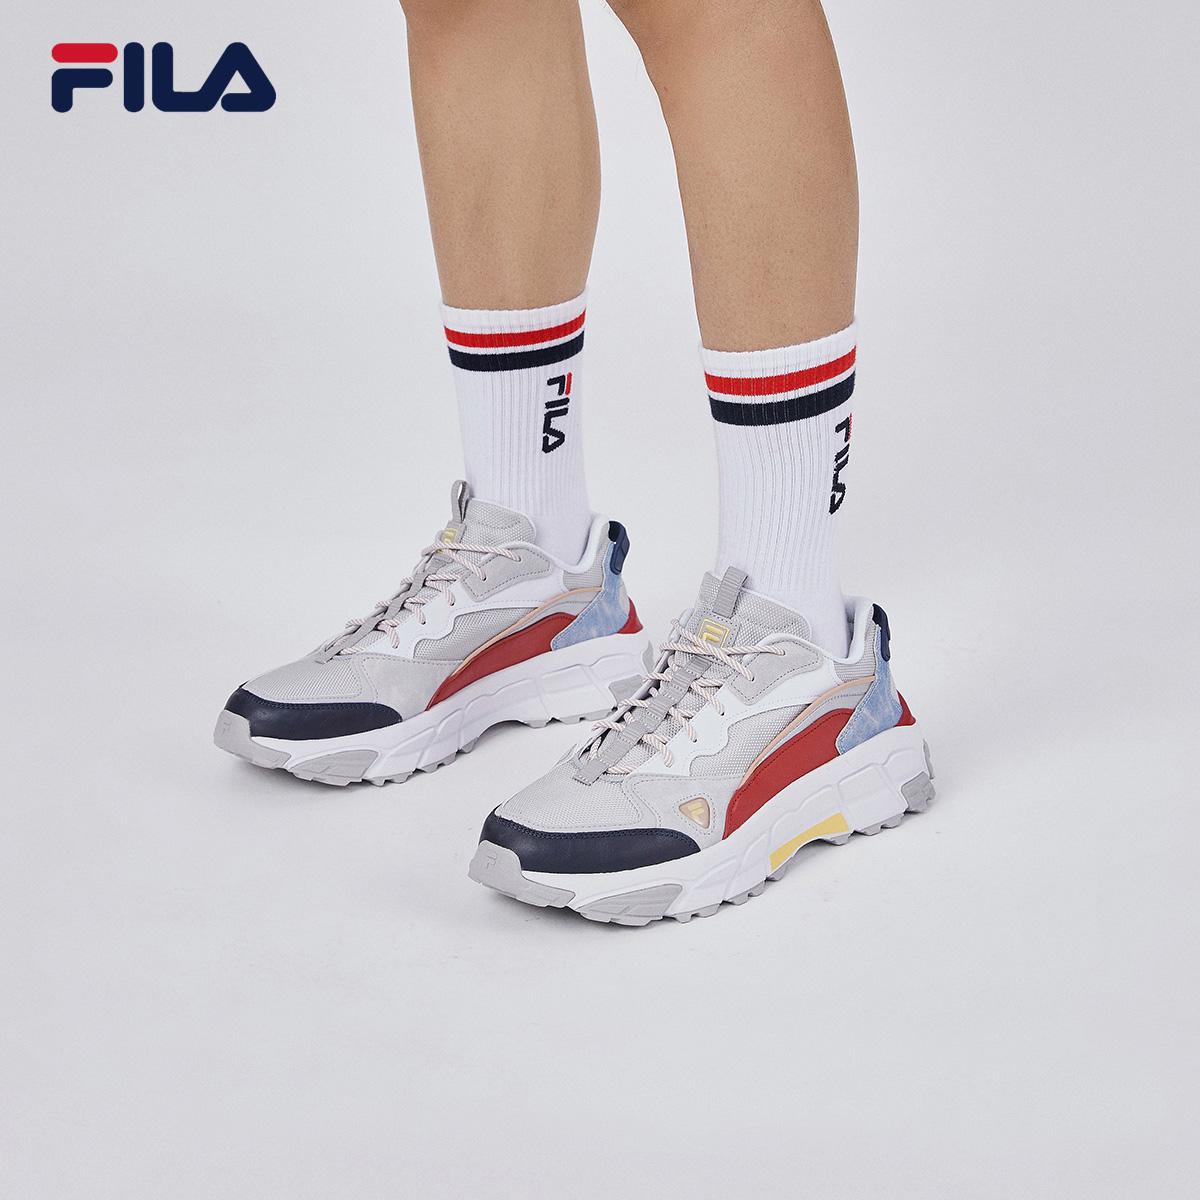 fila黄景瑜skyrunner跑步鞋男鞋质量怎么样